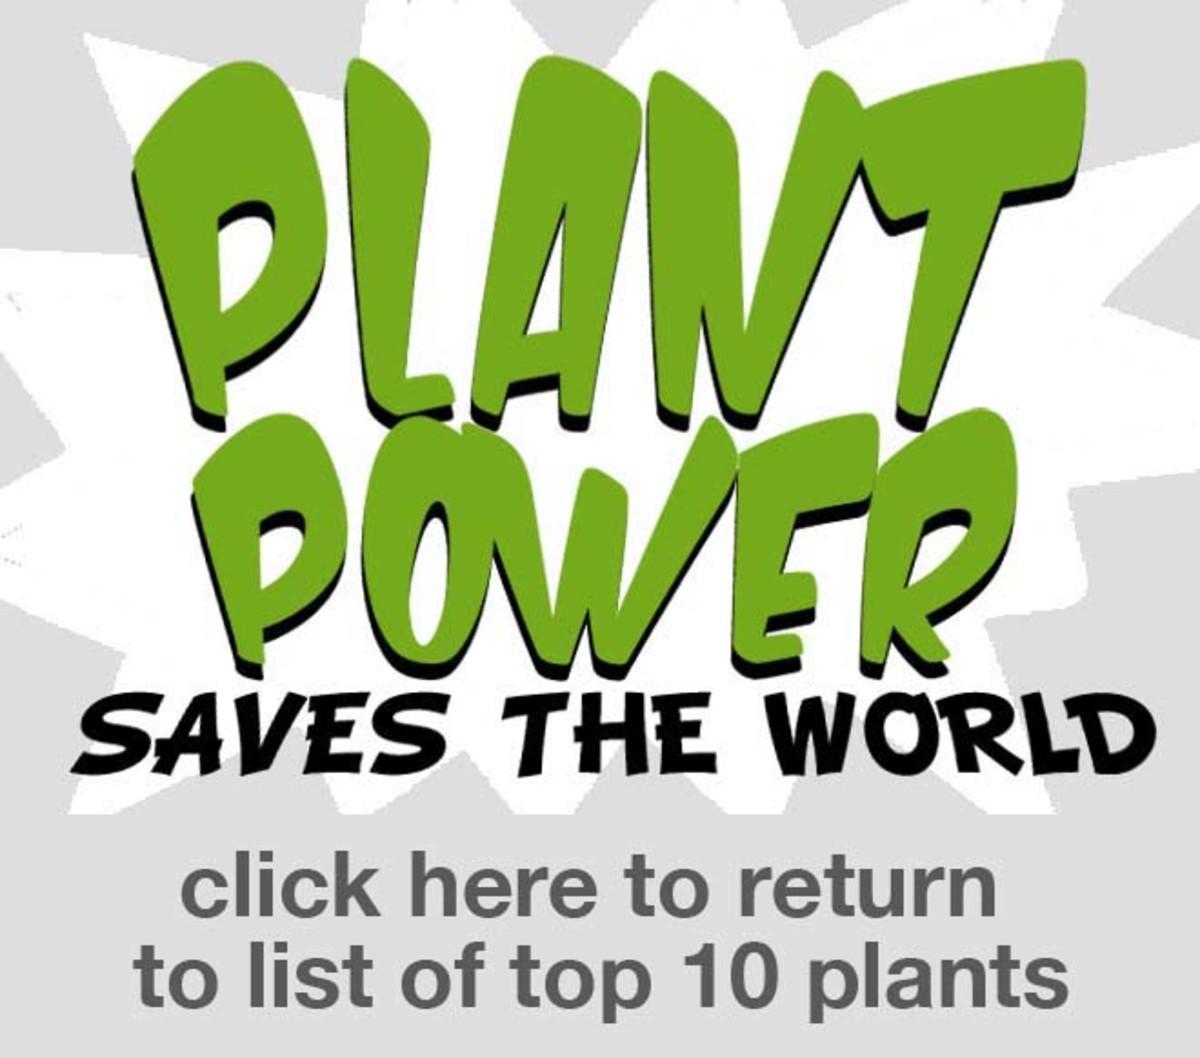 TOP_10_PLANTS_LOGO_v2